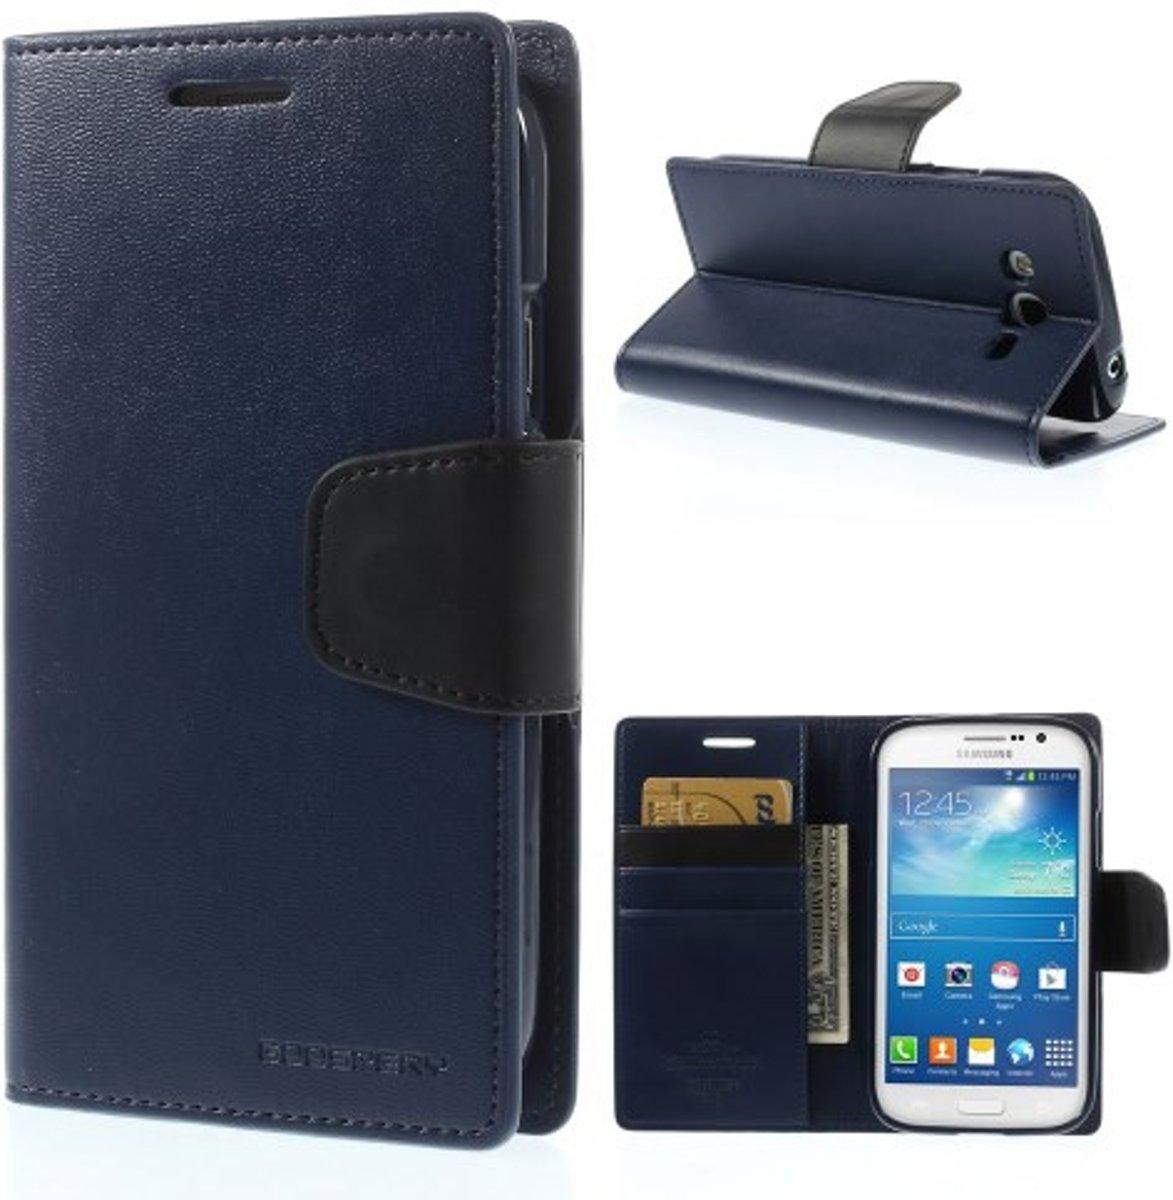 Goospery Sonata Leather Hoesje Samsung Galaxy Grand Neo Tempered Glass I9060 Blauw